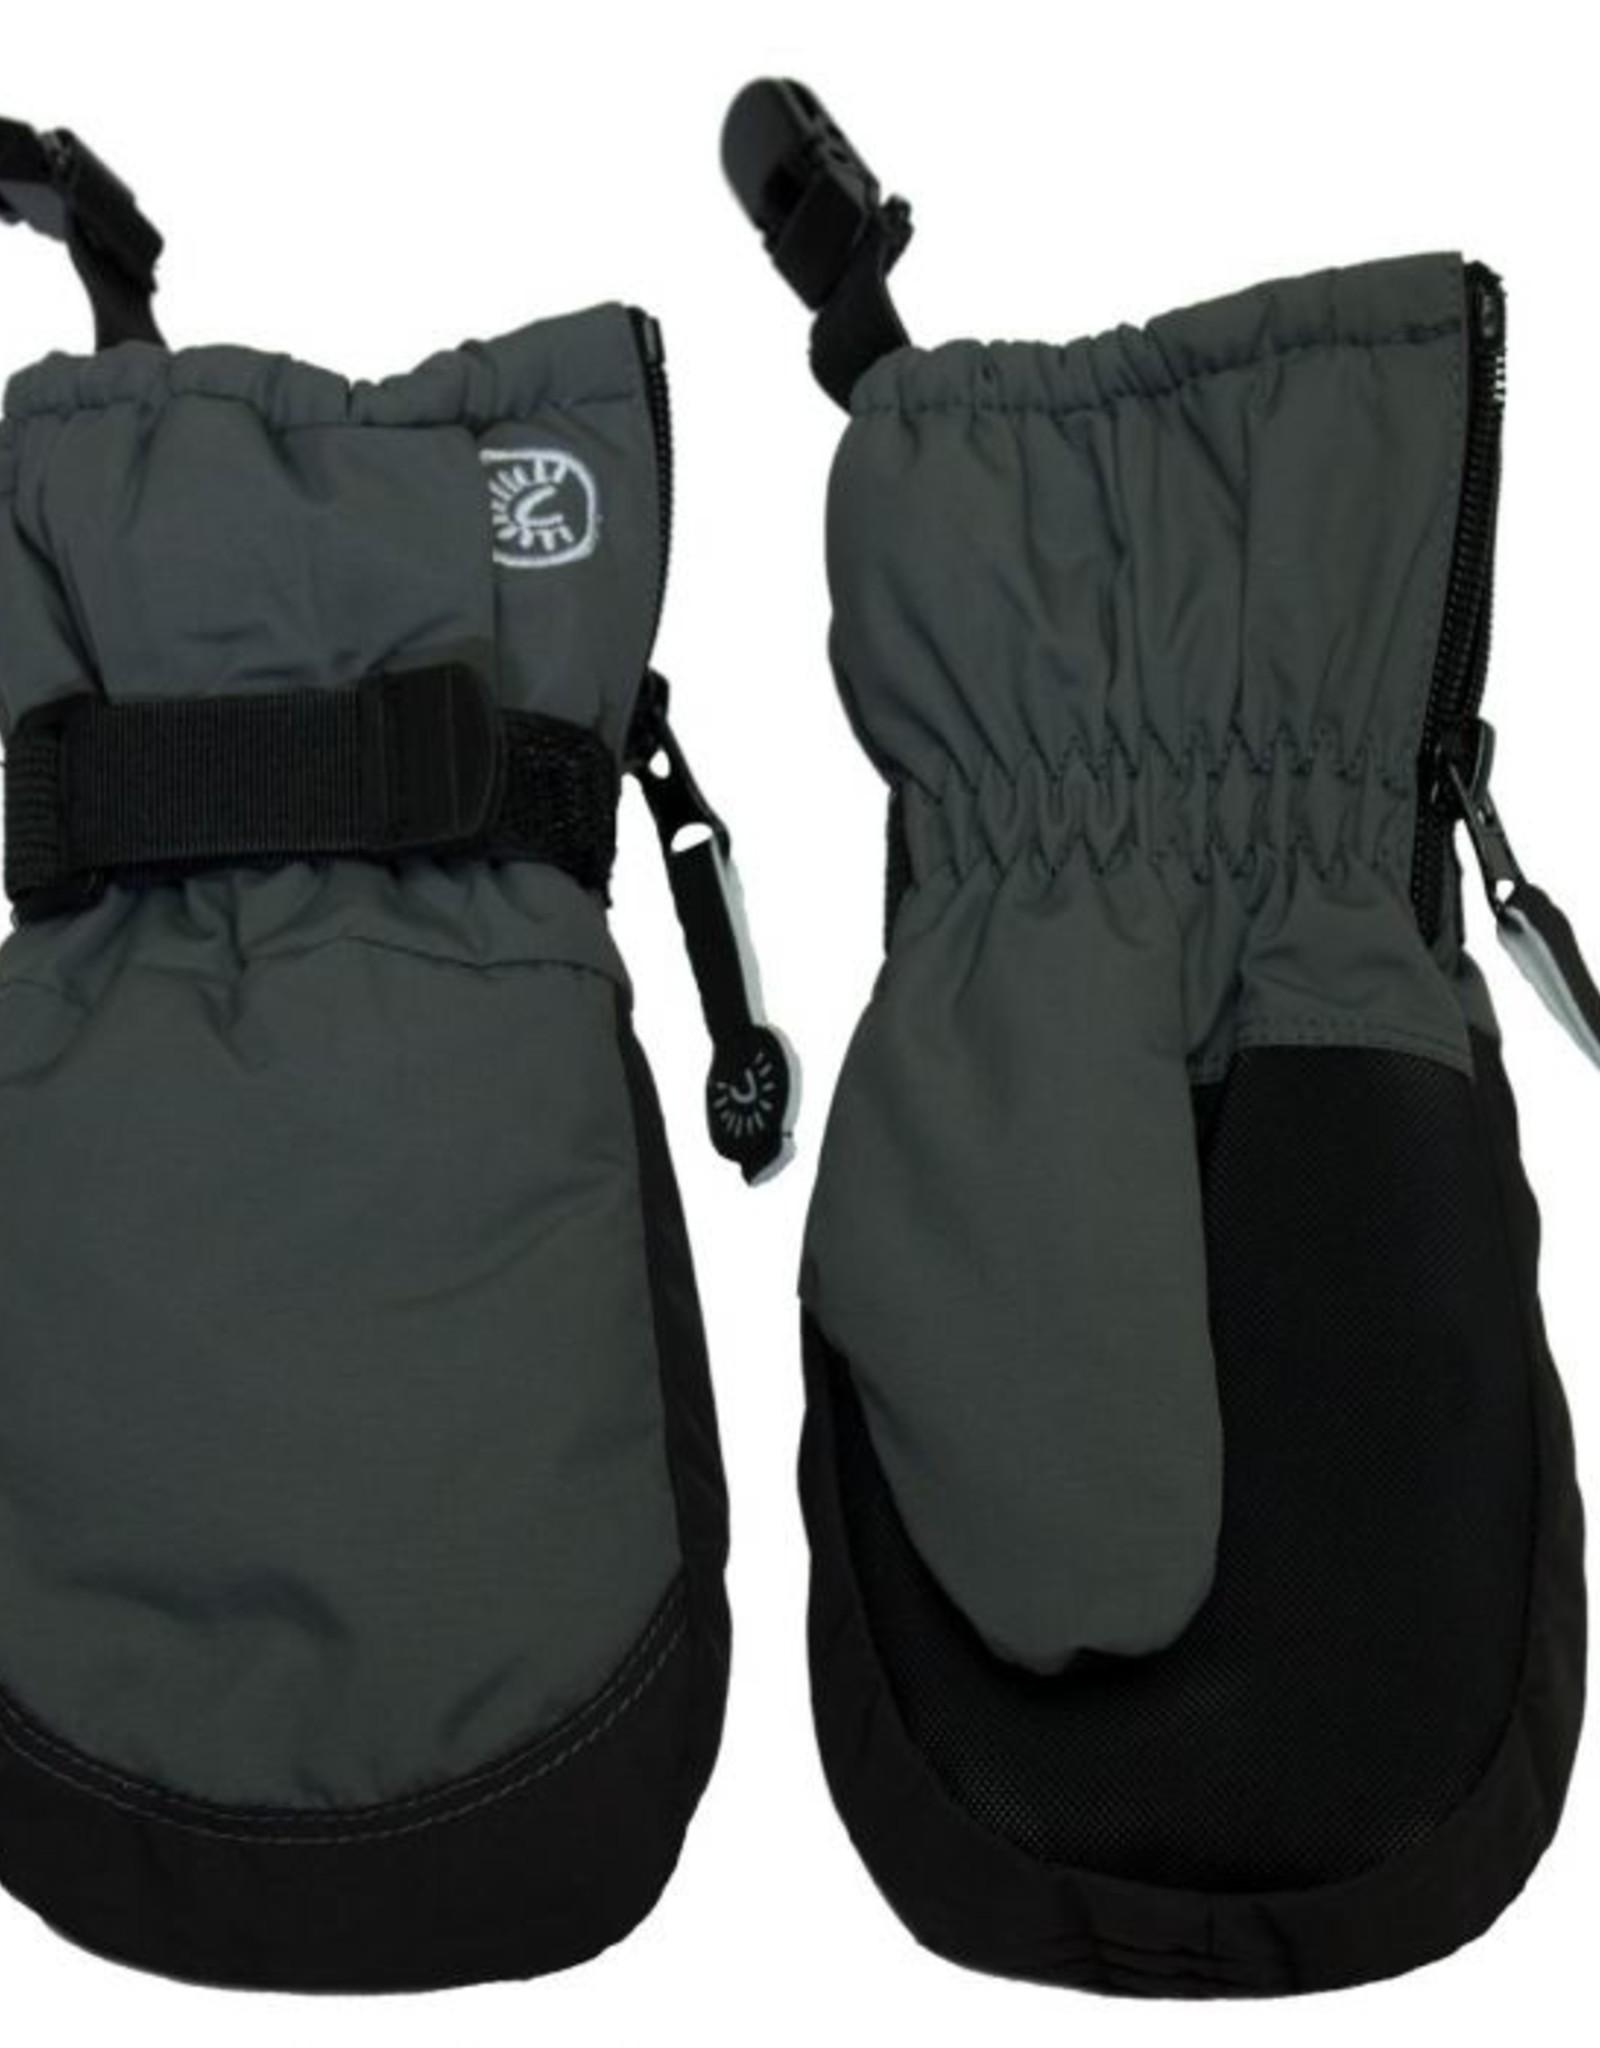 CaliKids FA20 Grey Waterproof Mitten w/Clip